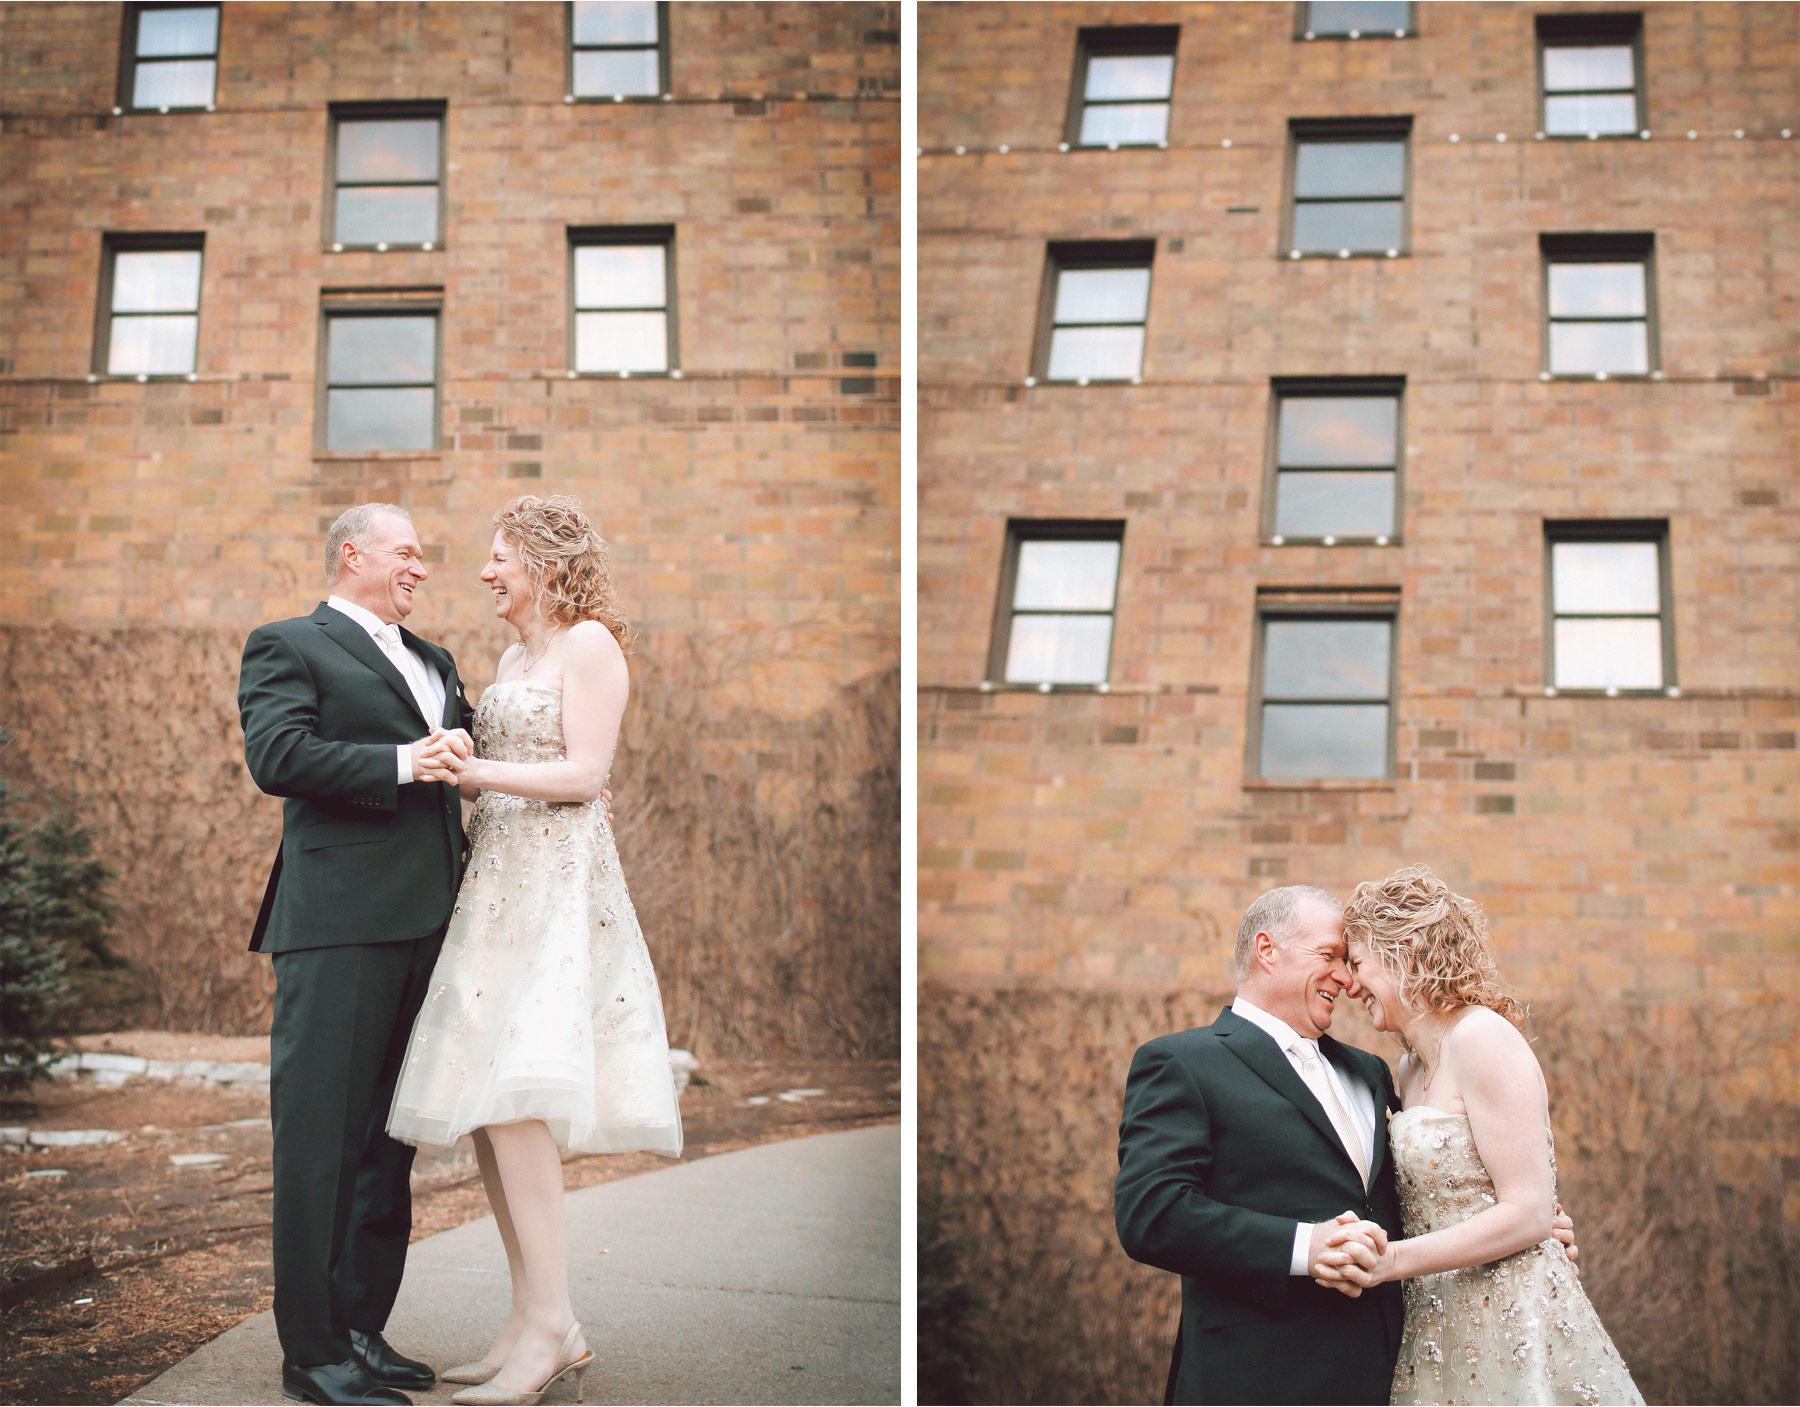 08-Saint-Paul-Minnesota-Wedding-Photographer-by-Andrew-Vick-Photography-Winter-Landmark-Center-Bride-Groom-Embrace-Laughter-Vintage-Dannette-and-Darren.jpg